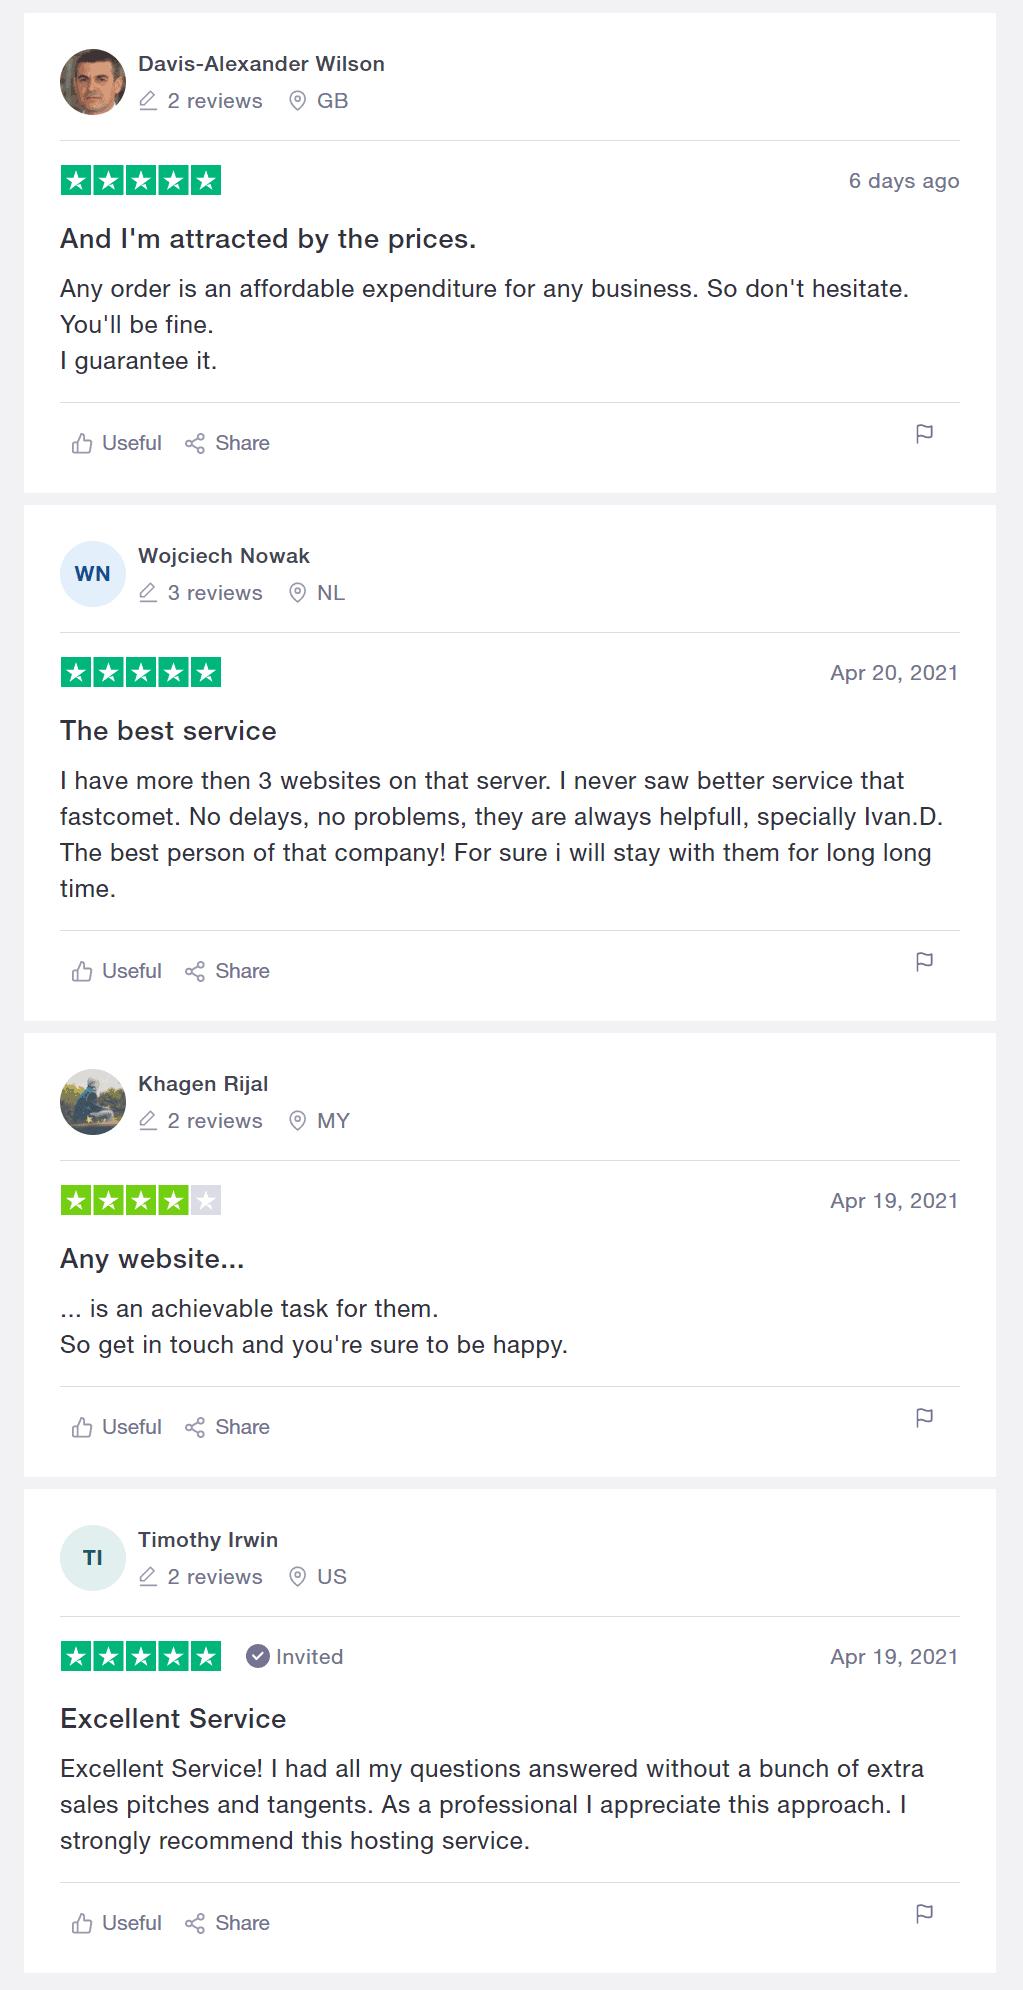 FastComet-Reviews-Read-Customer-Service-Reviews-of-www-fastcomet-com